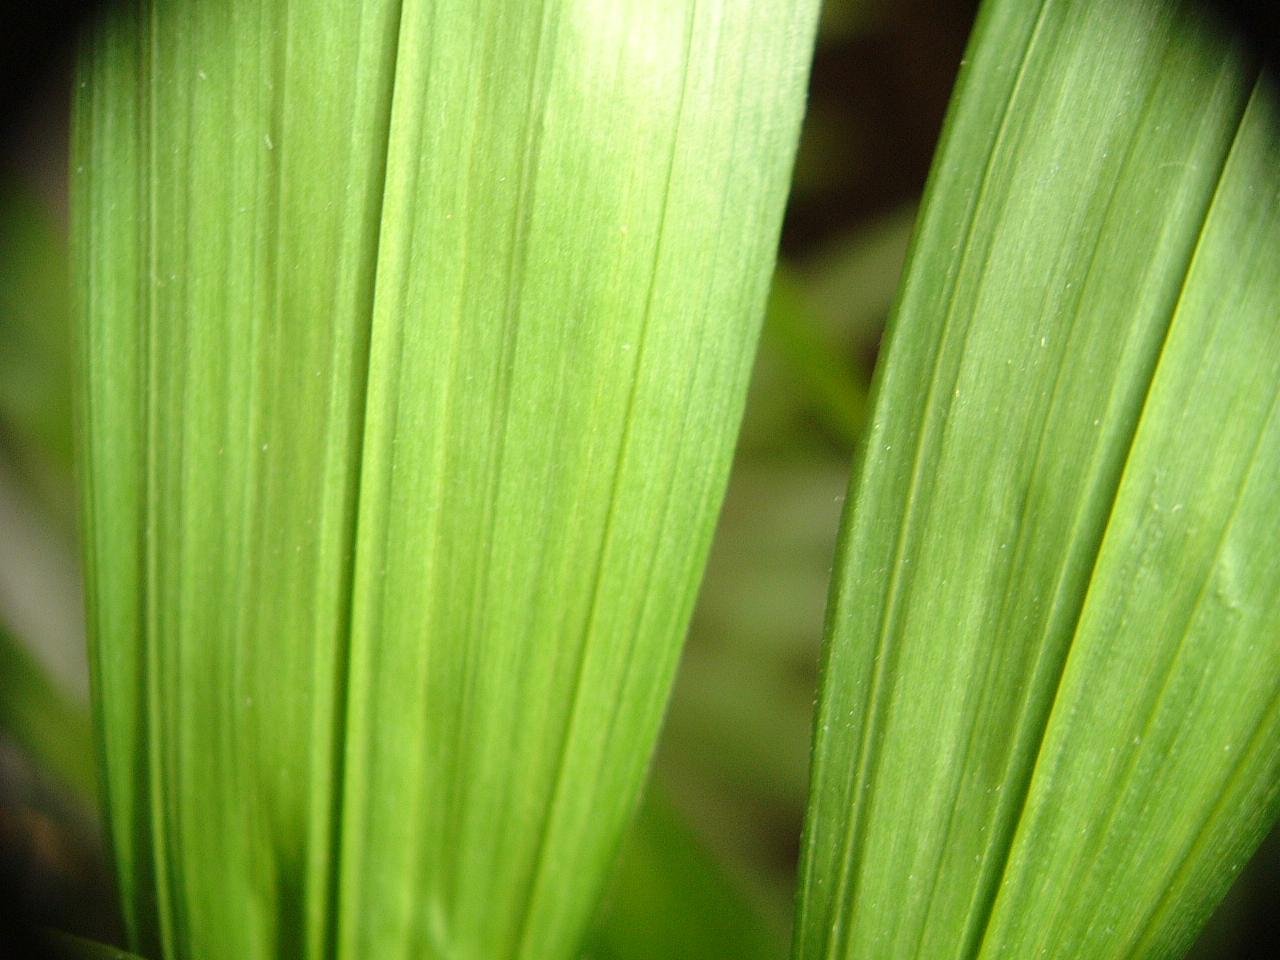 maartent leaves closeup green veines